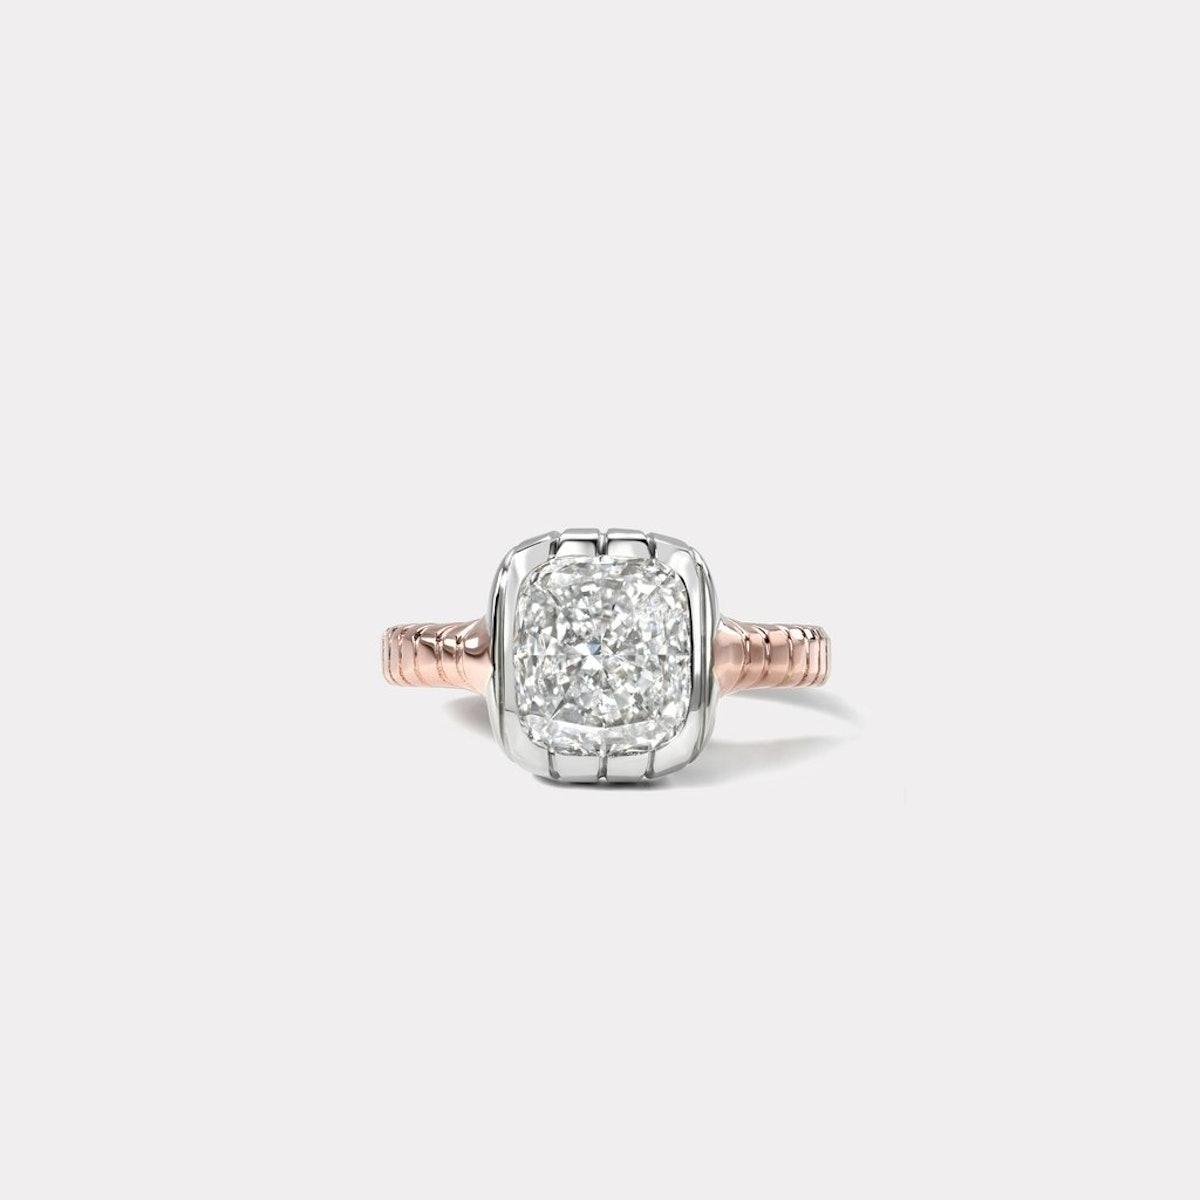 One Of A Kind Diamond Cushion Cut Heirloom Bezel Ring